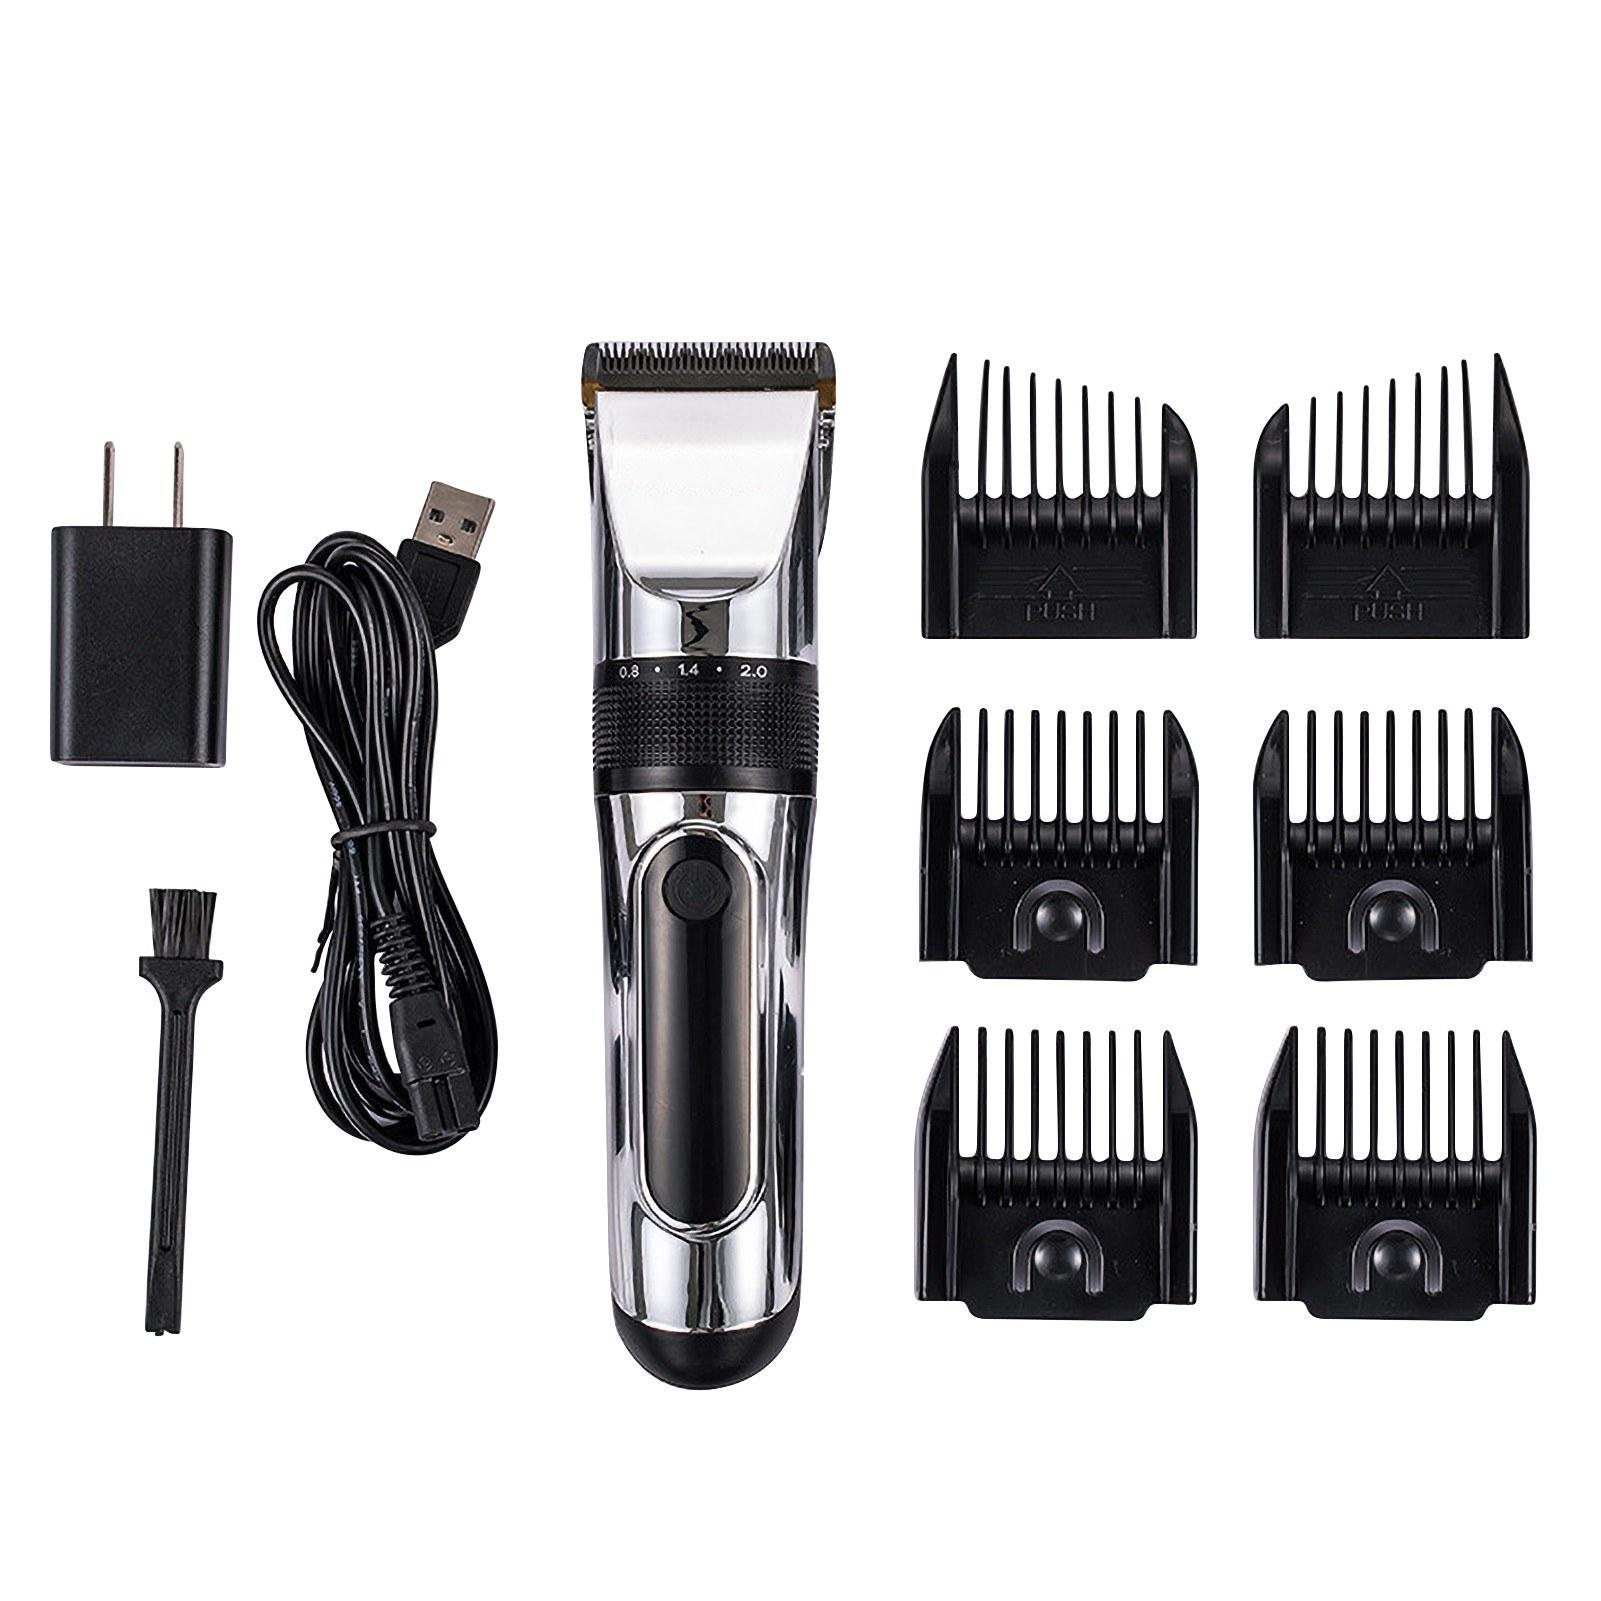 Cafago - 66% OFF LCD Digital Display Screen Hair Trimmer Quiet Waterproof Cordless Hair Shear Kit,free shipping+$20.32